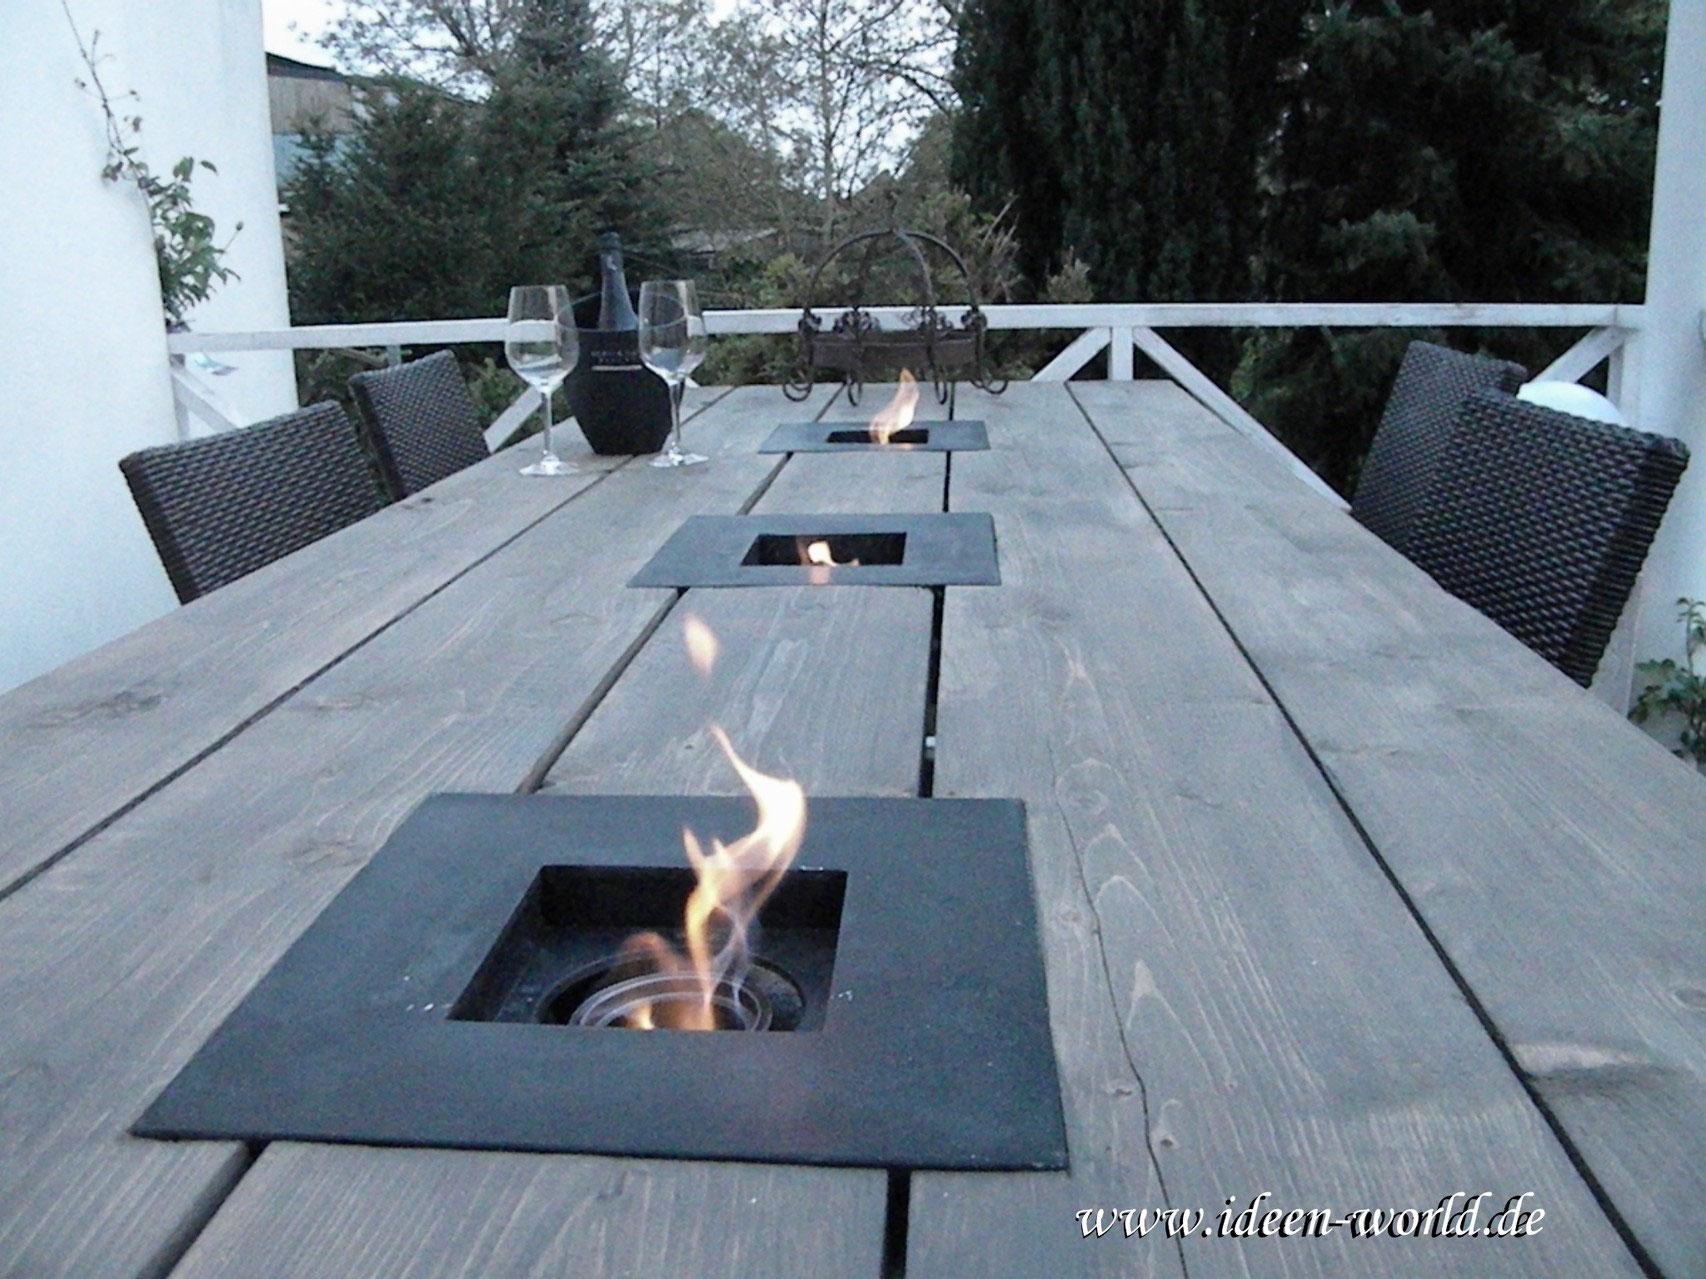 Tisch/Unikate - www.ideen-world.de Holz Deko Tisch Möbel Unikate